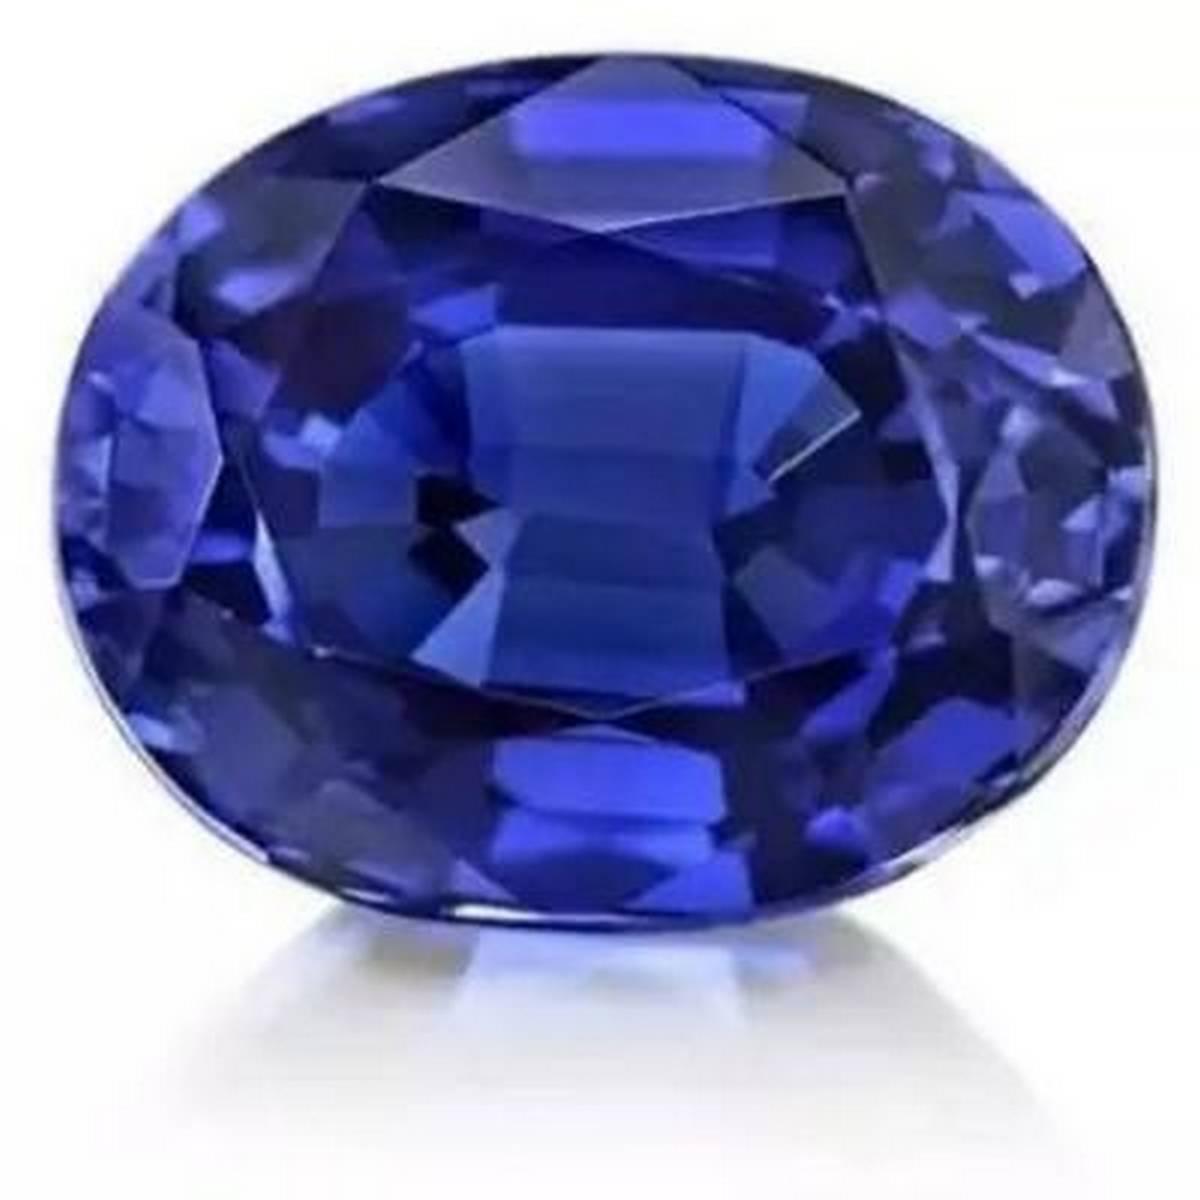 Zircon Ovel Shape Gemstone in Blue Color 2.5 grams (Original)